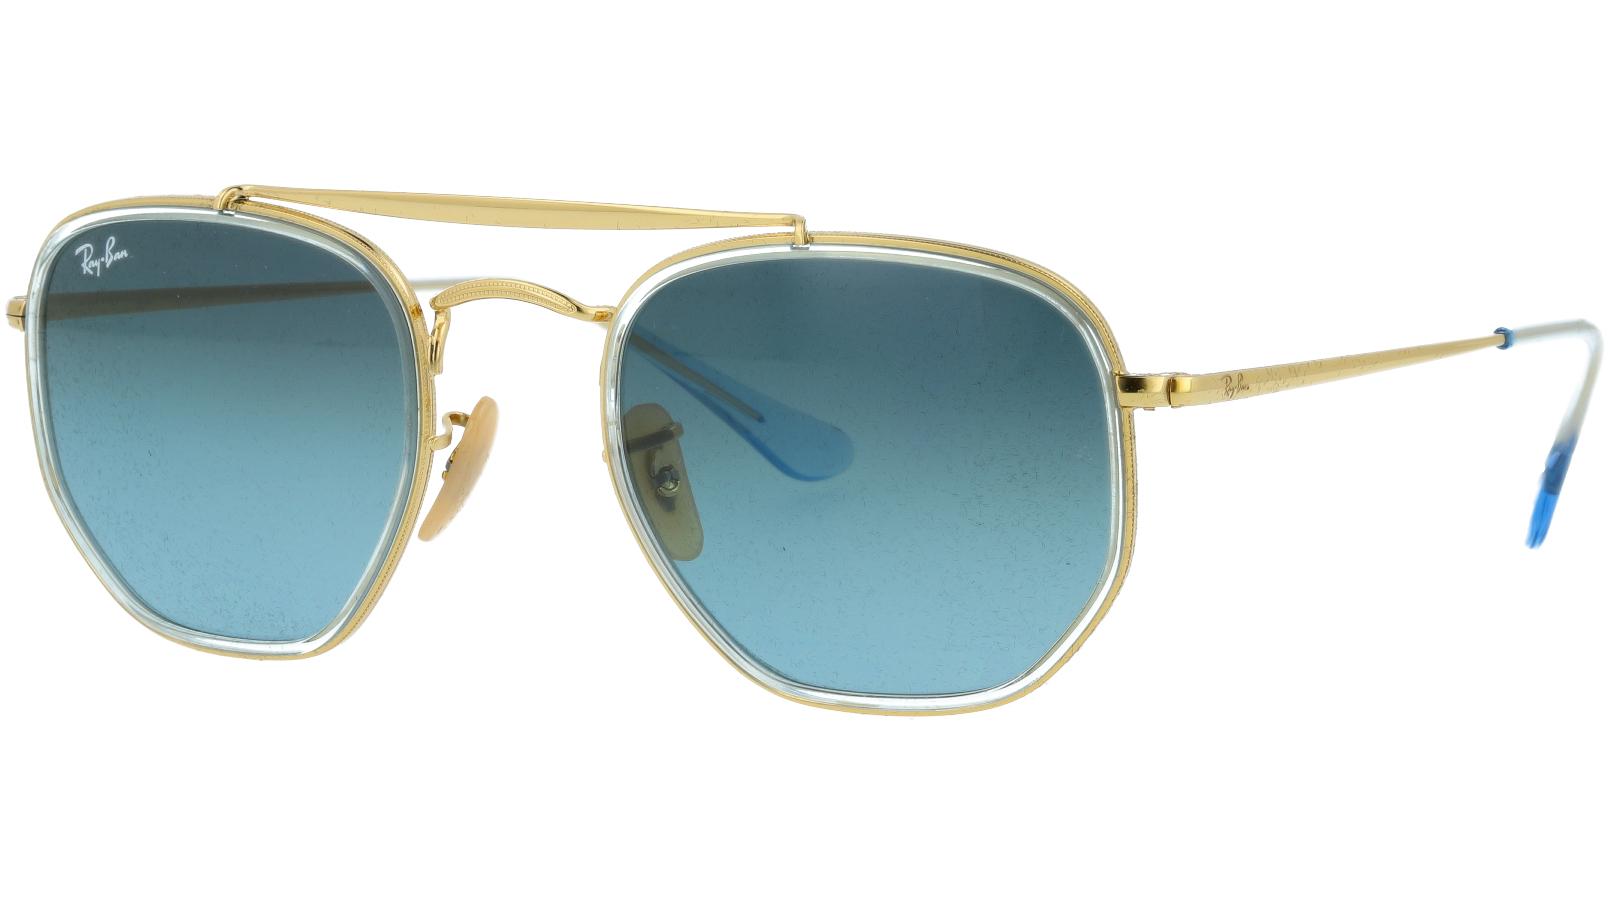 Ray-Ban RB3648M 91233M 52 Arista Sunglasses